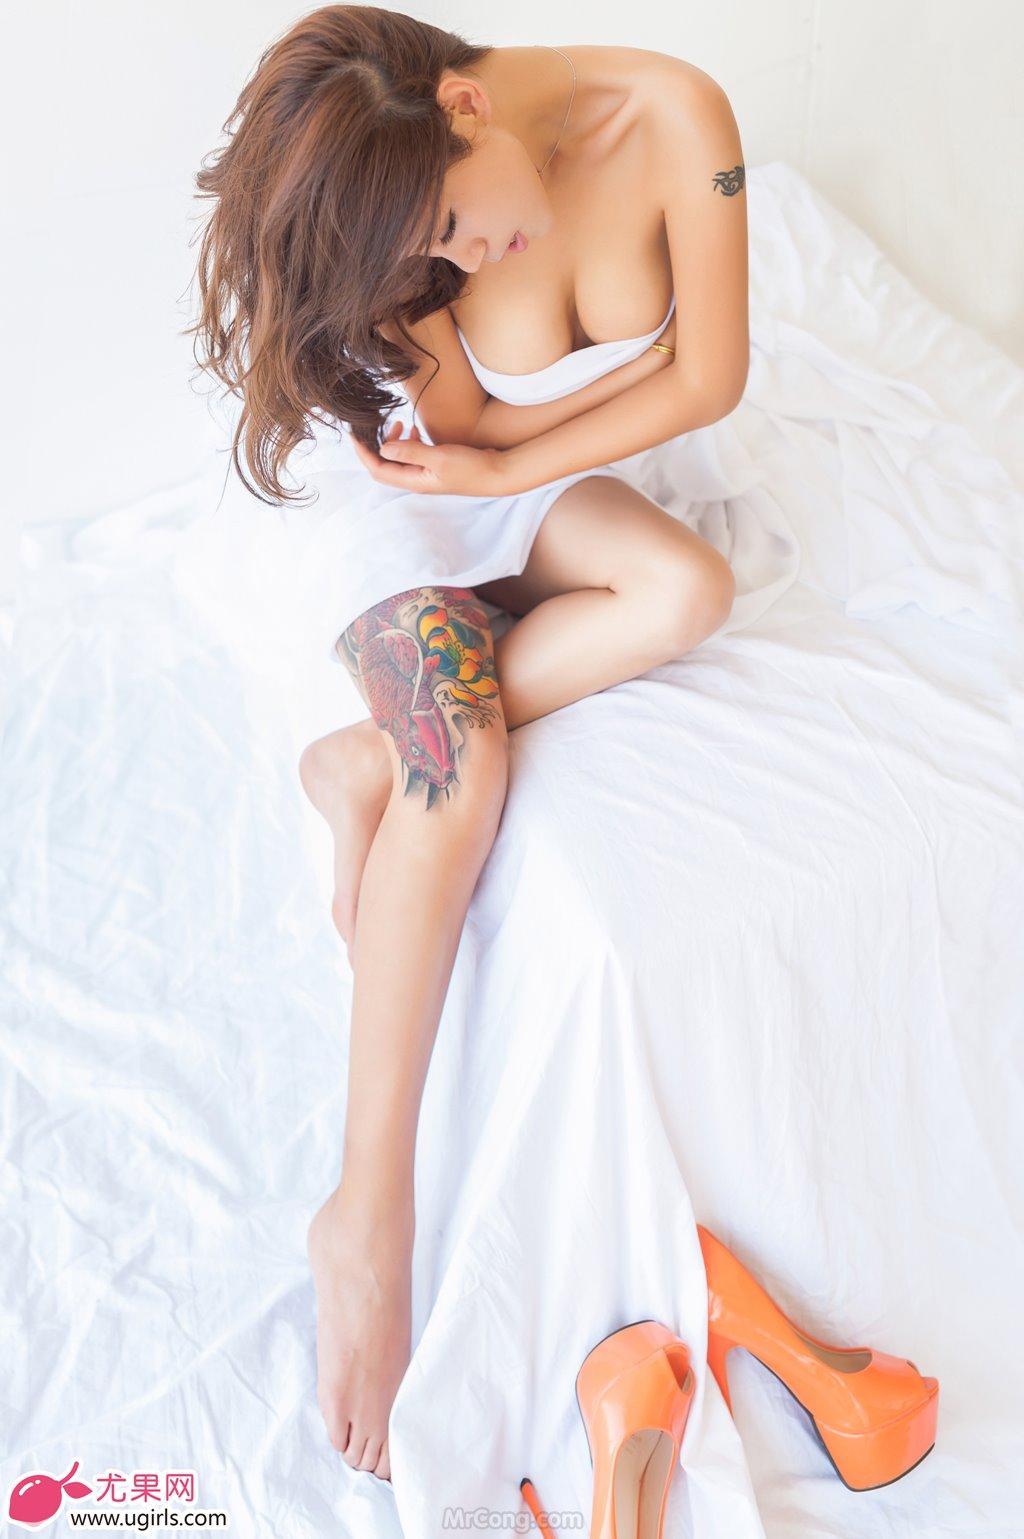 Image MrCong.com-UGIRLS-020-Tian-Yi-Yi-018 in post Người đẹp Tian Yi Yi (田依依) khoe ngực trần sexy trong bộ ảnh UGIRLS 020